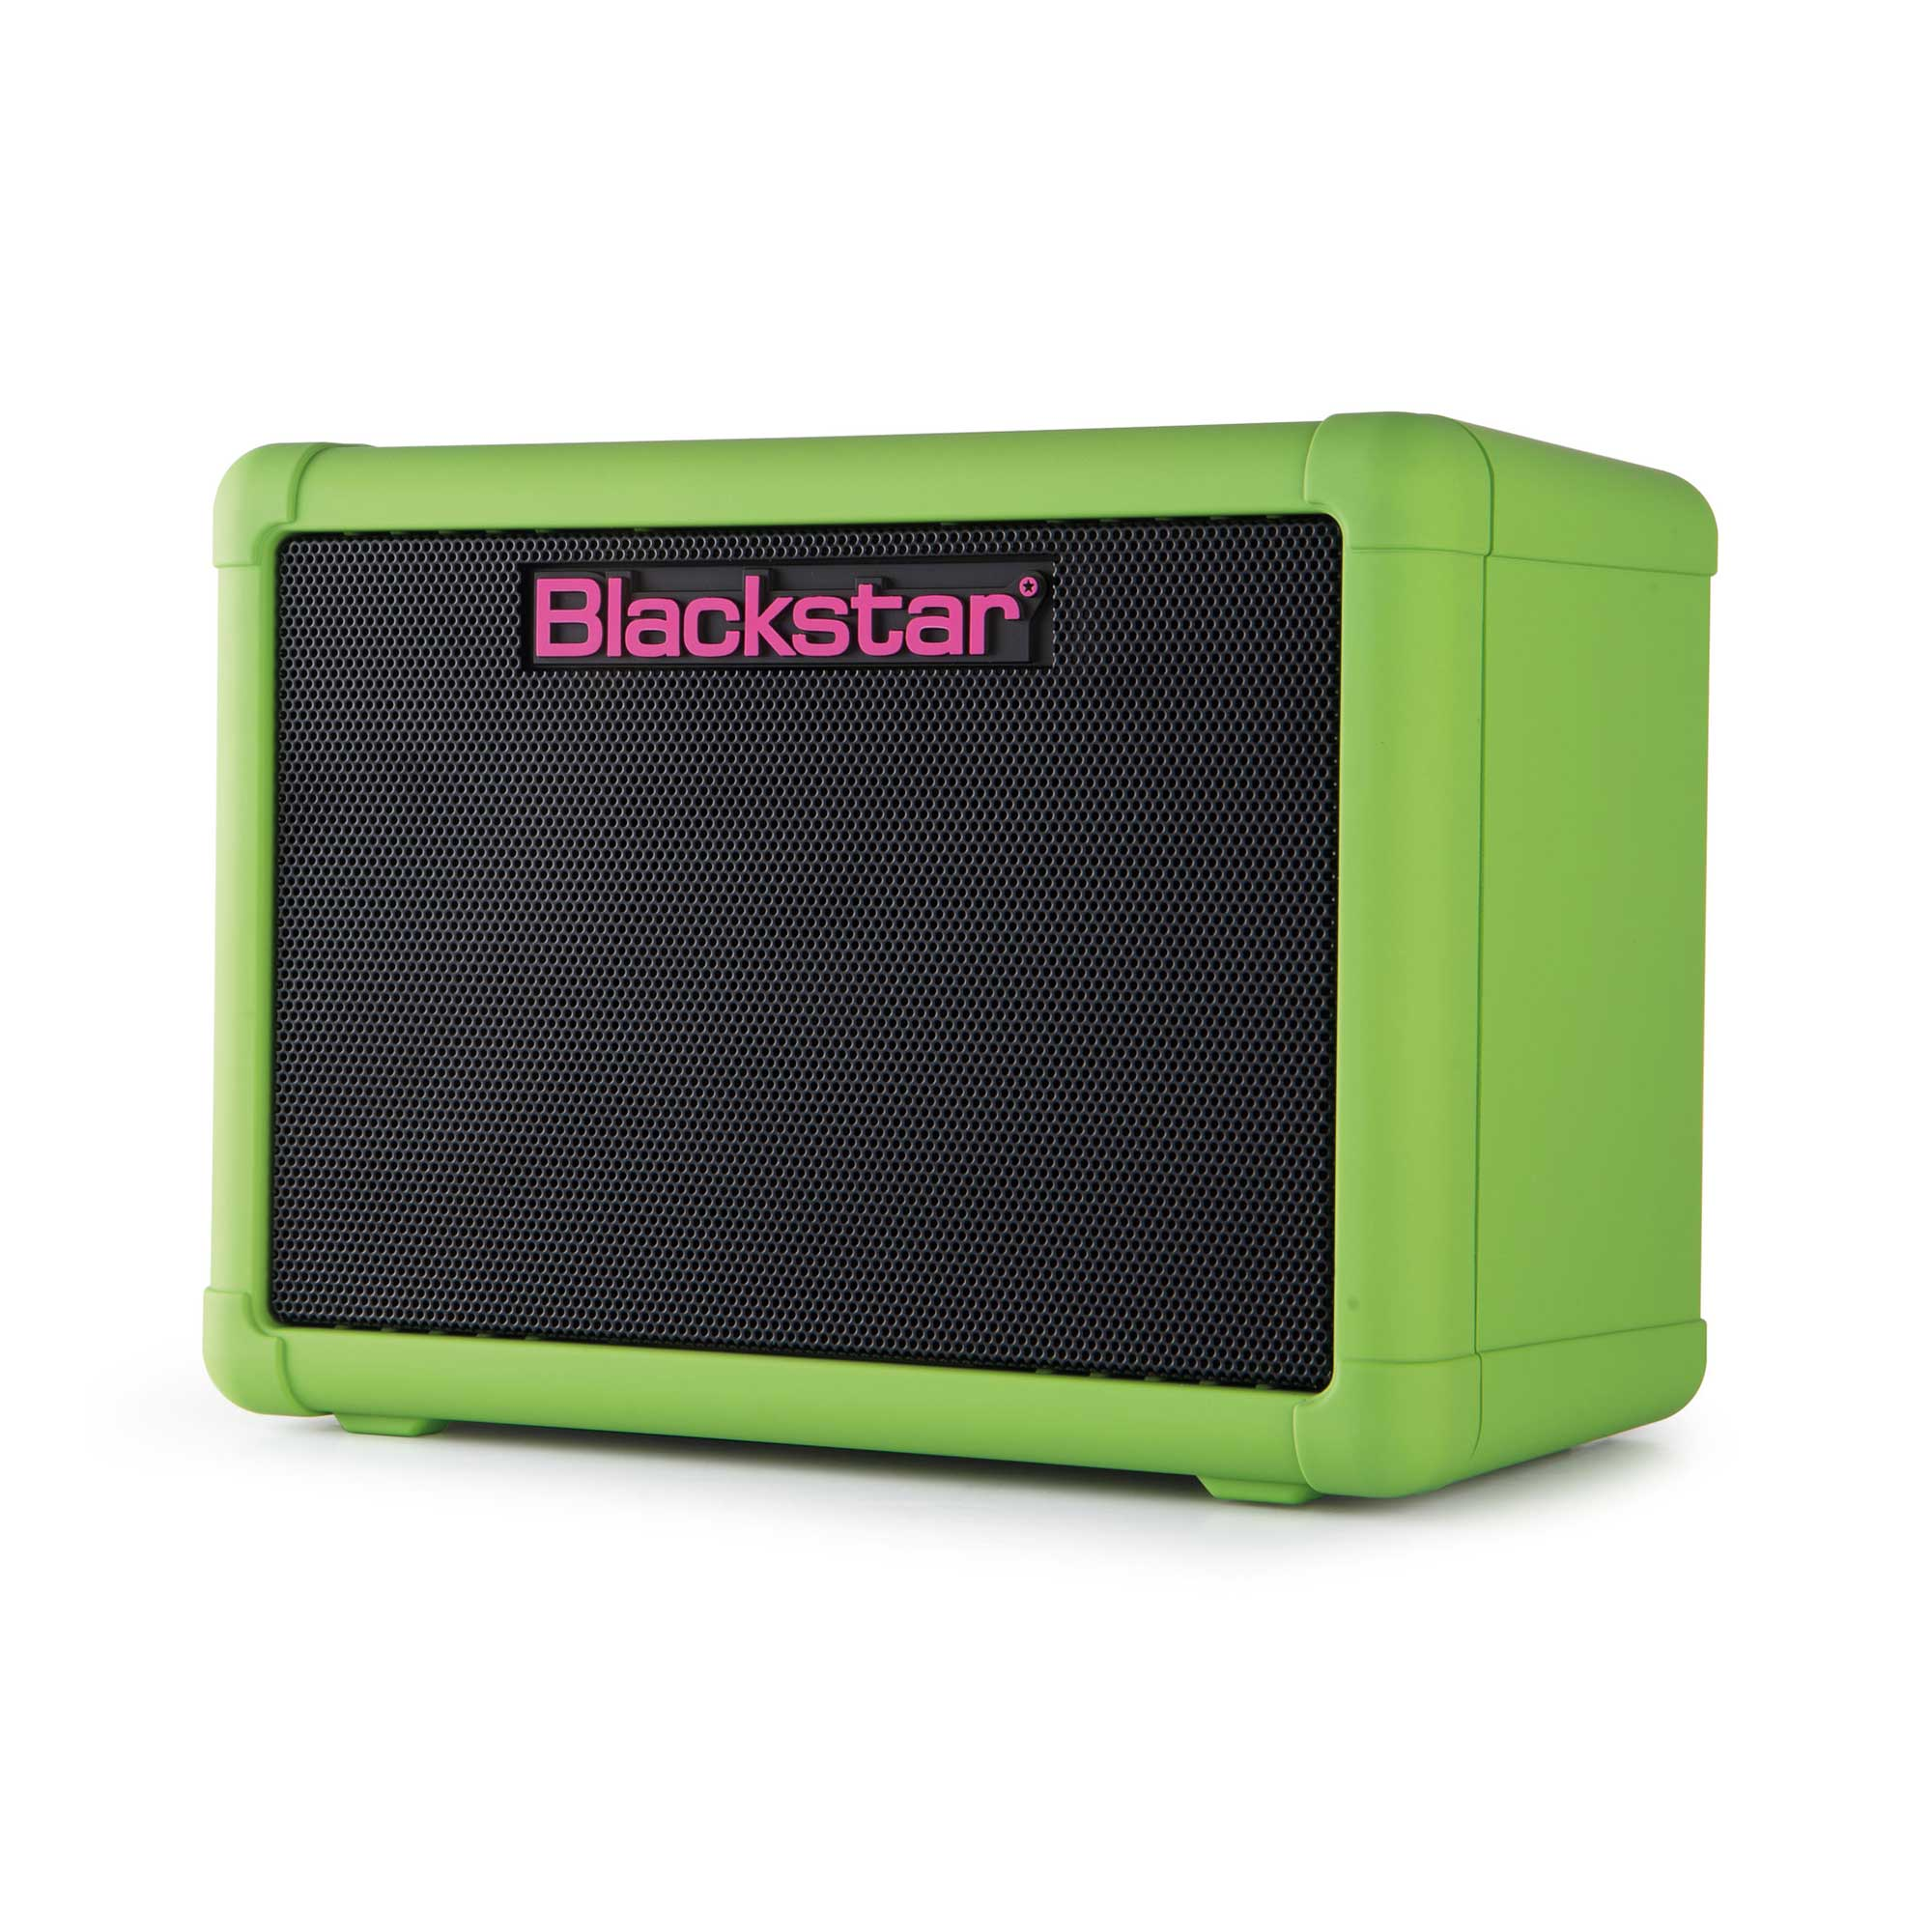 Blackstar Fly 3 Day Neon Green